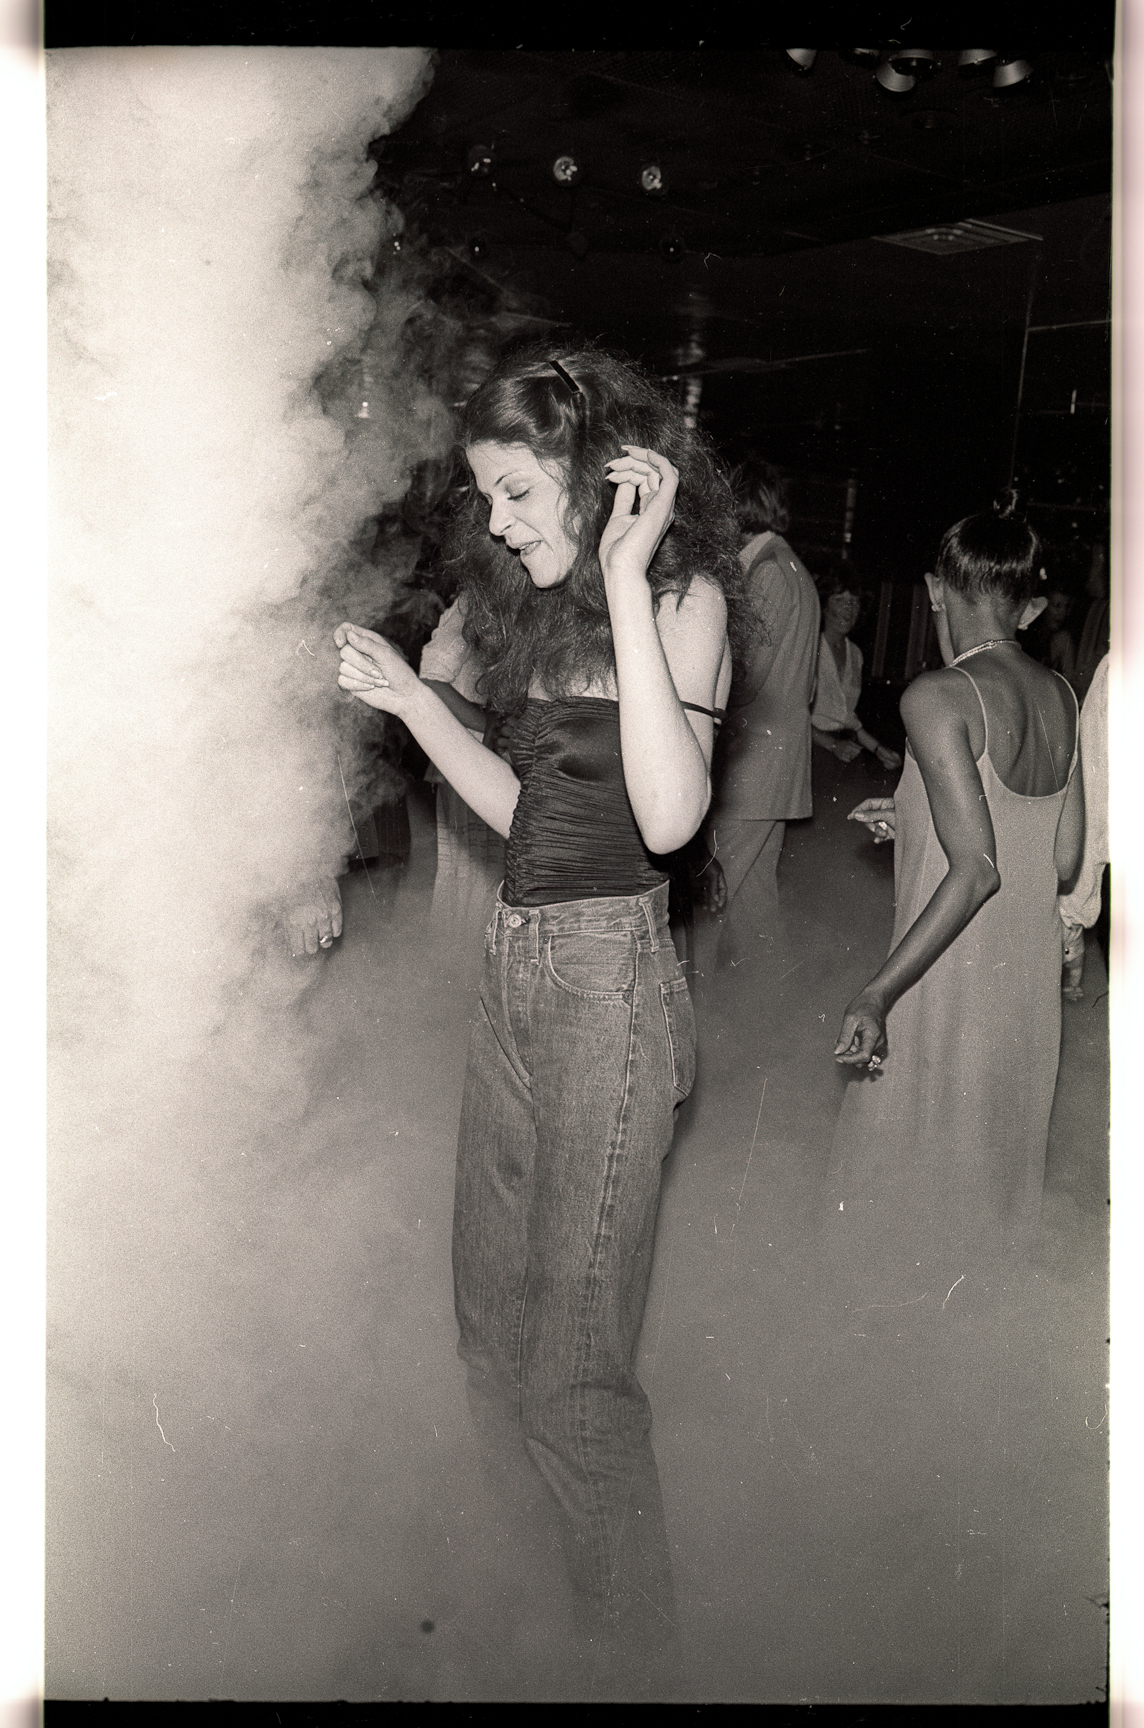 Gilda Radner at Studio 54, photographed by Gene Spatz.